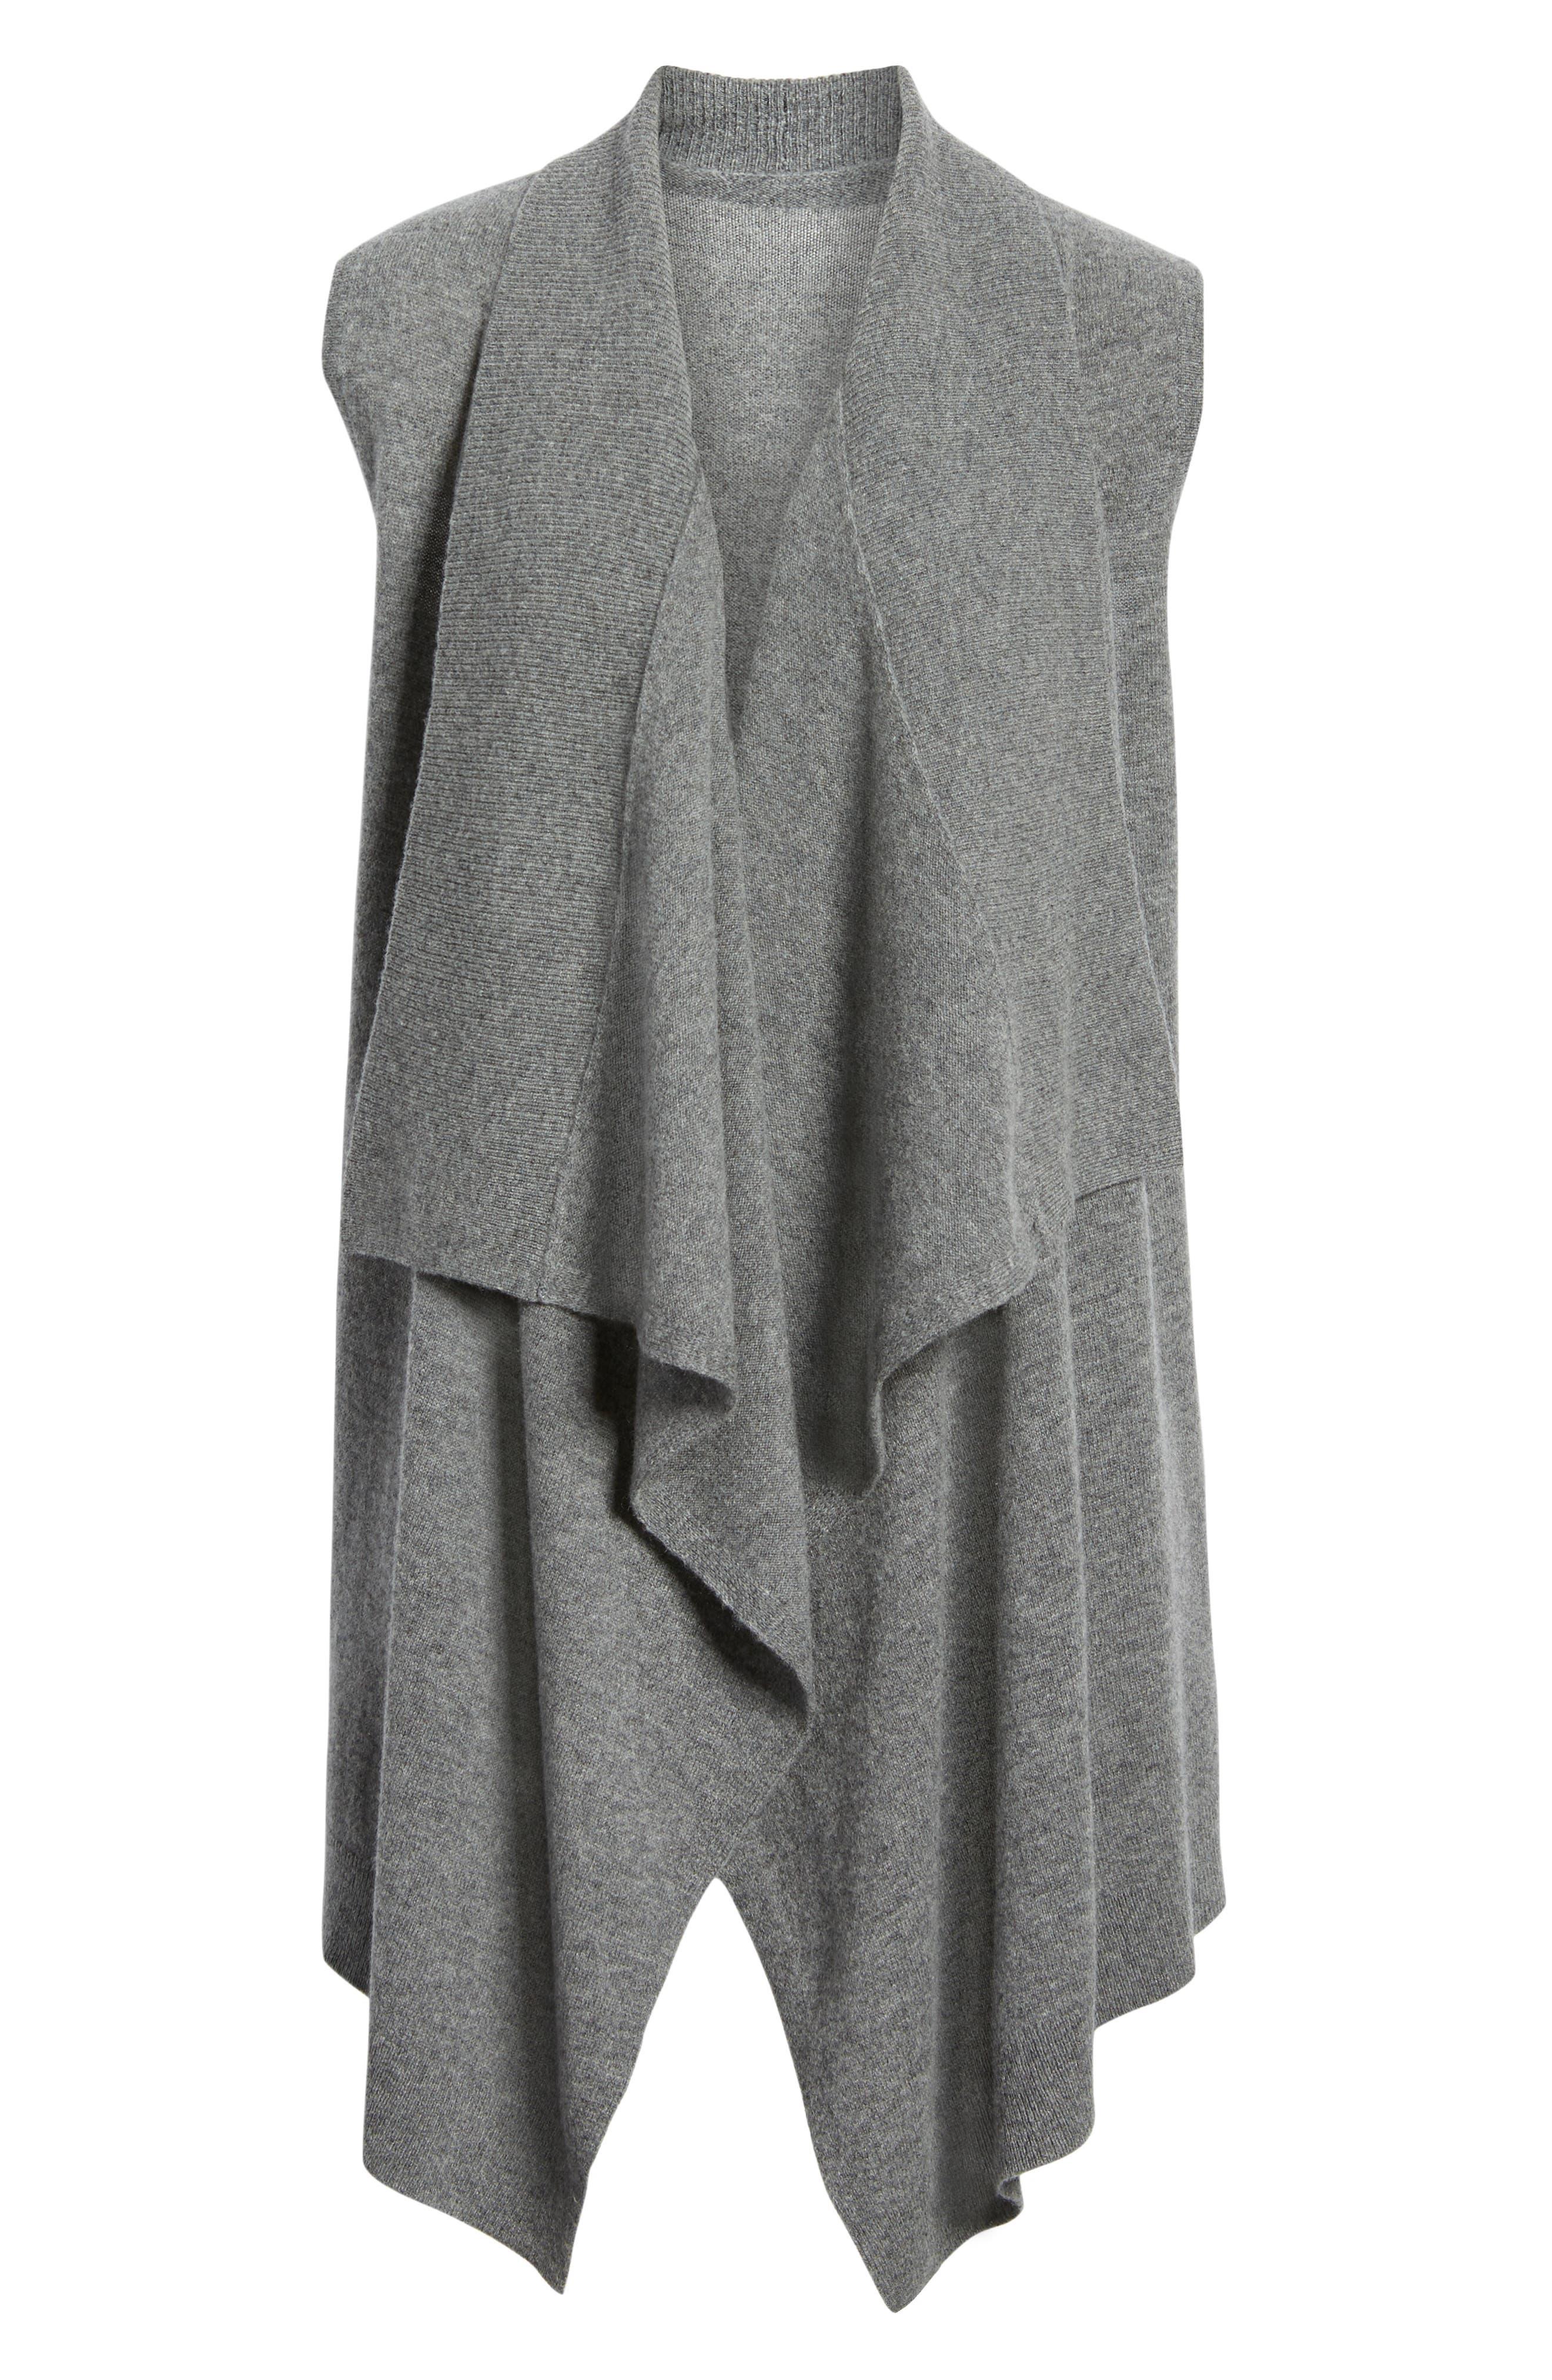 Petite Halogen Wool & Cashmere Drape Front Sweater Vest, Grey